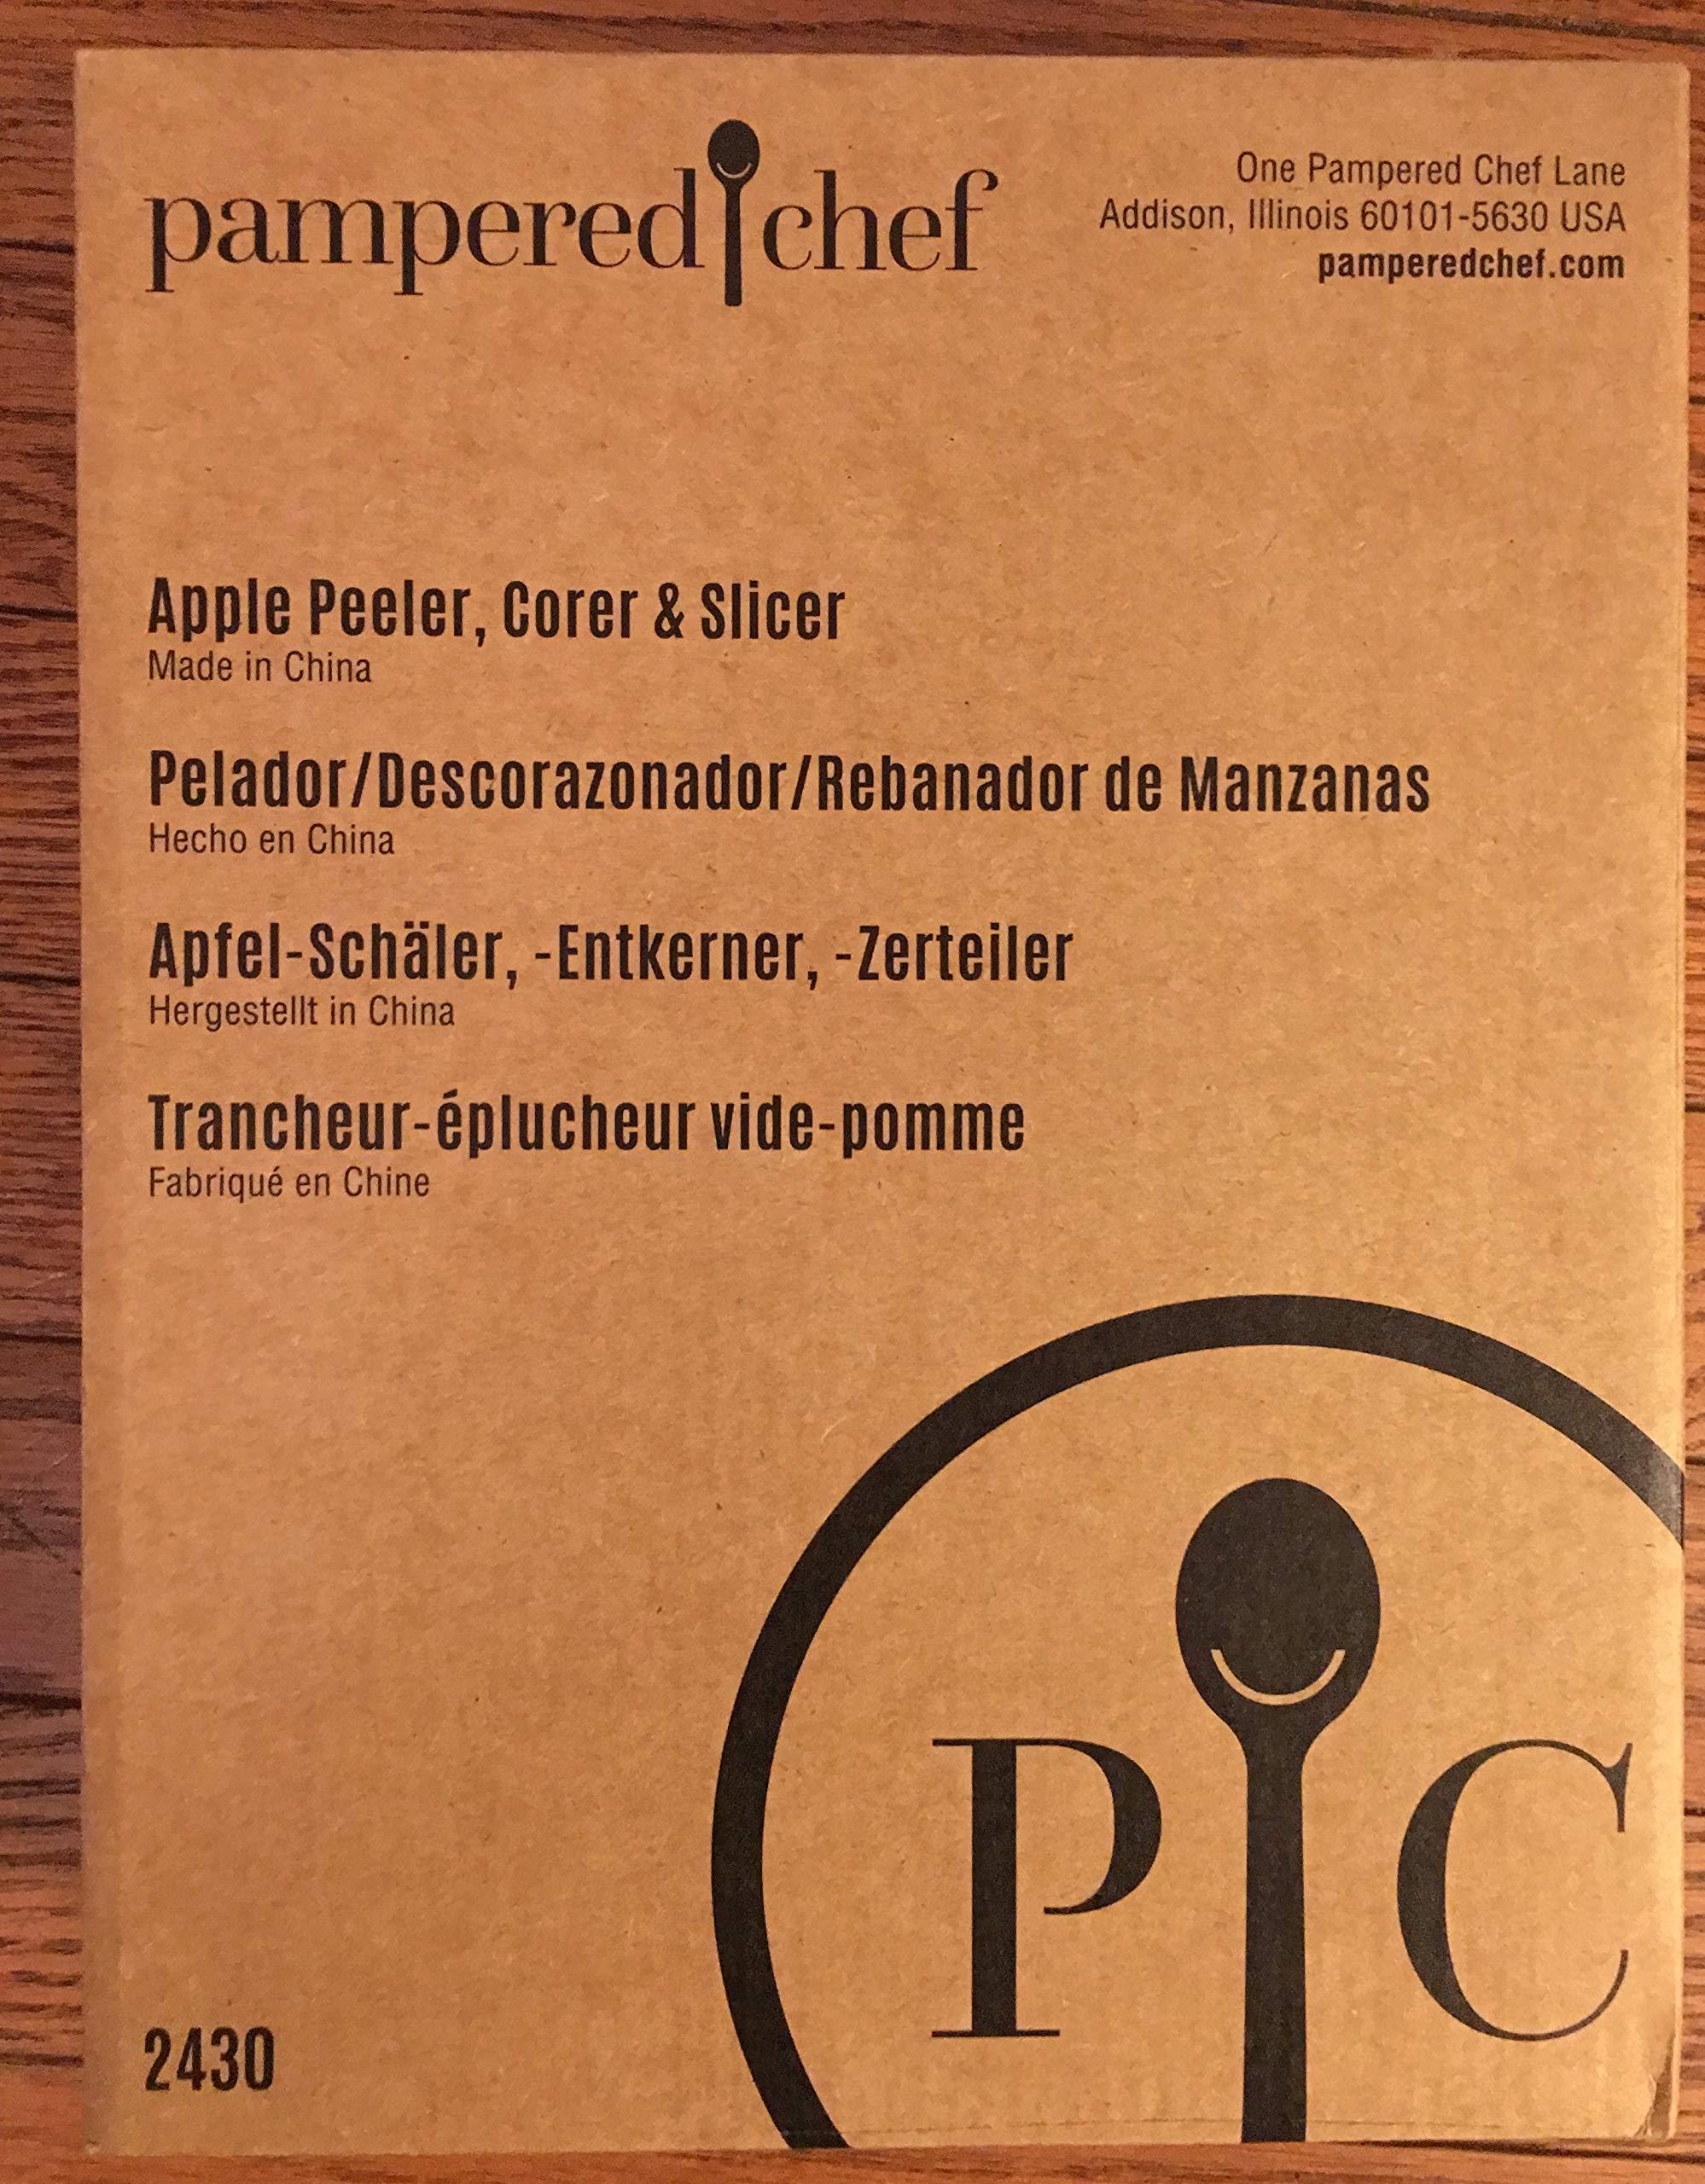 The Pampered Chef 2430 Apple Peeler, Corer, Slicer by Pampered Chef